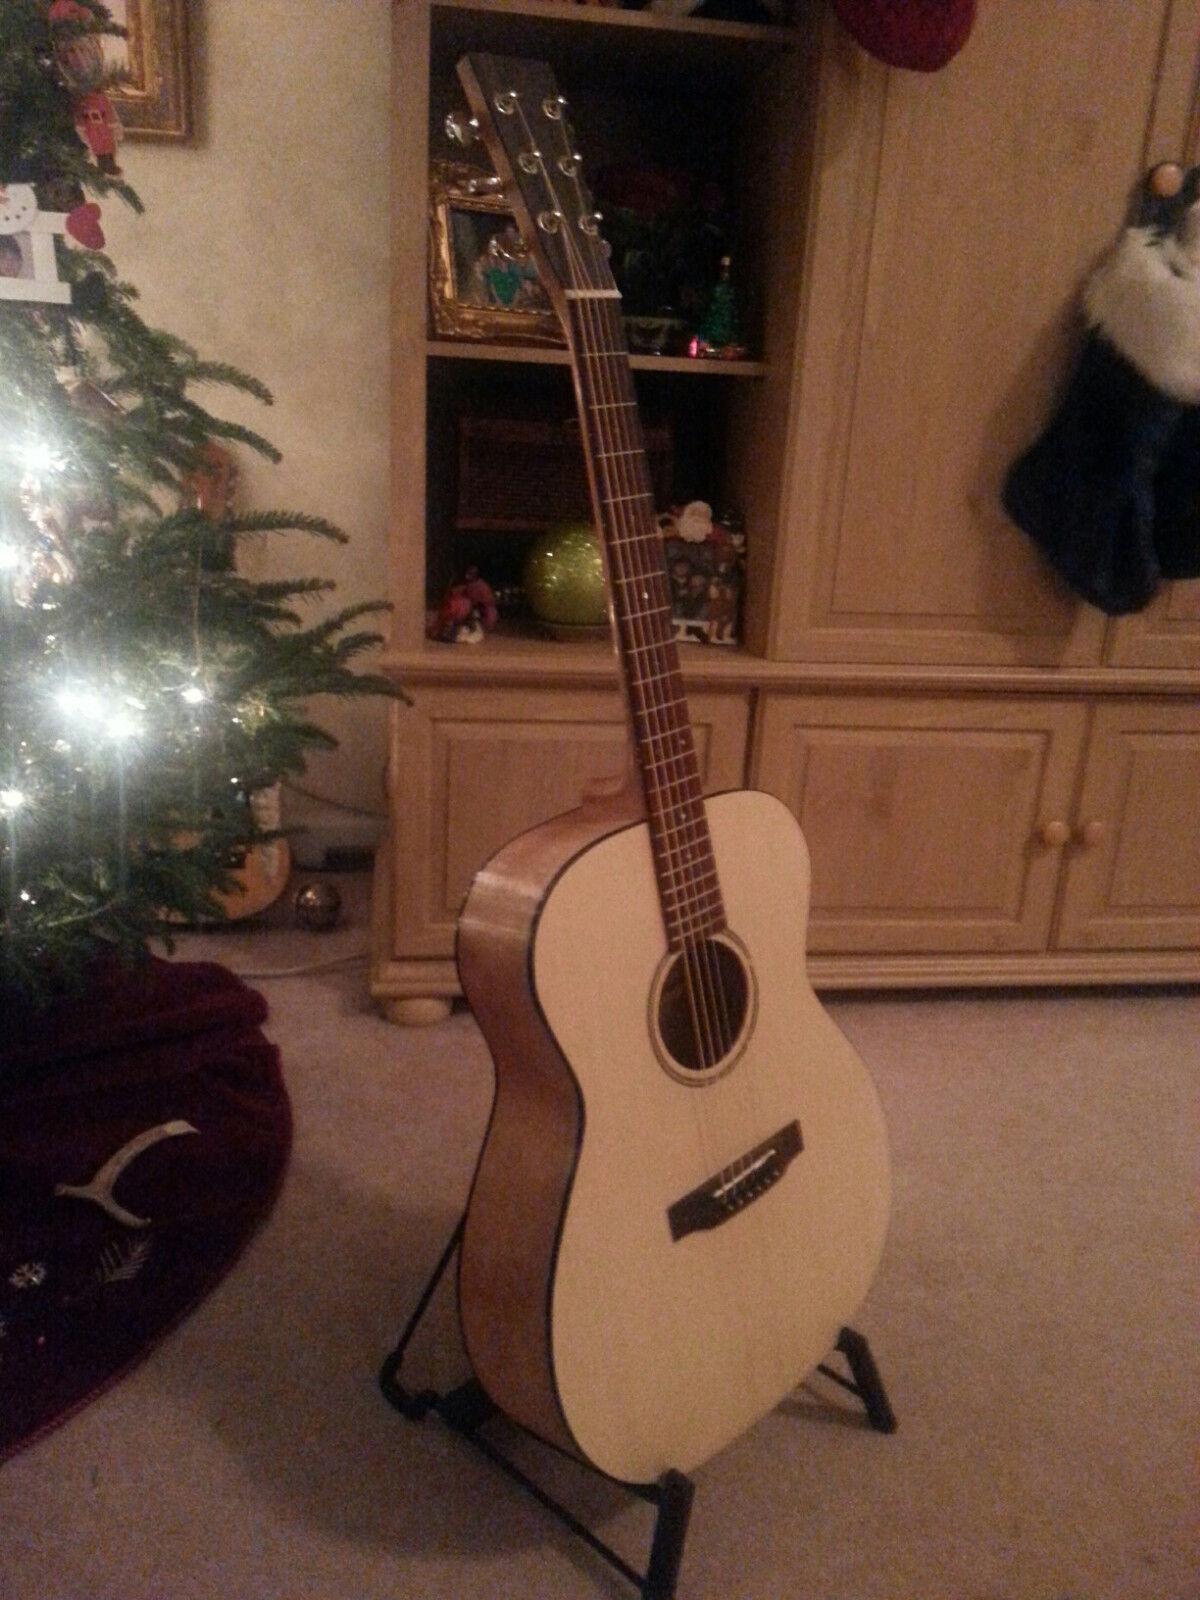 Parlor Gitarre Selbermachen Eigener Set Mahogany-Spruce Oberteil Komplett aus